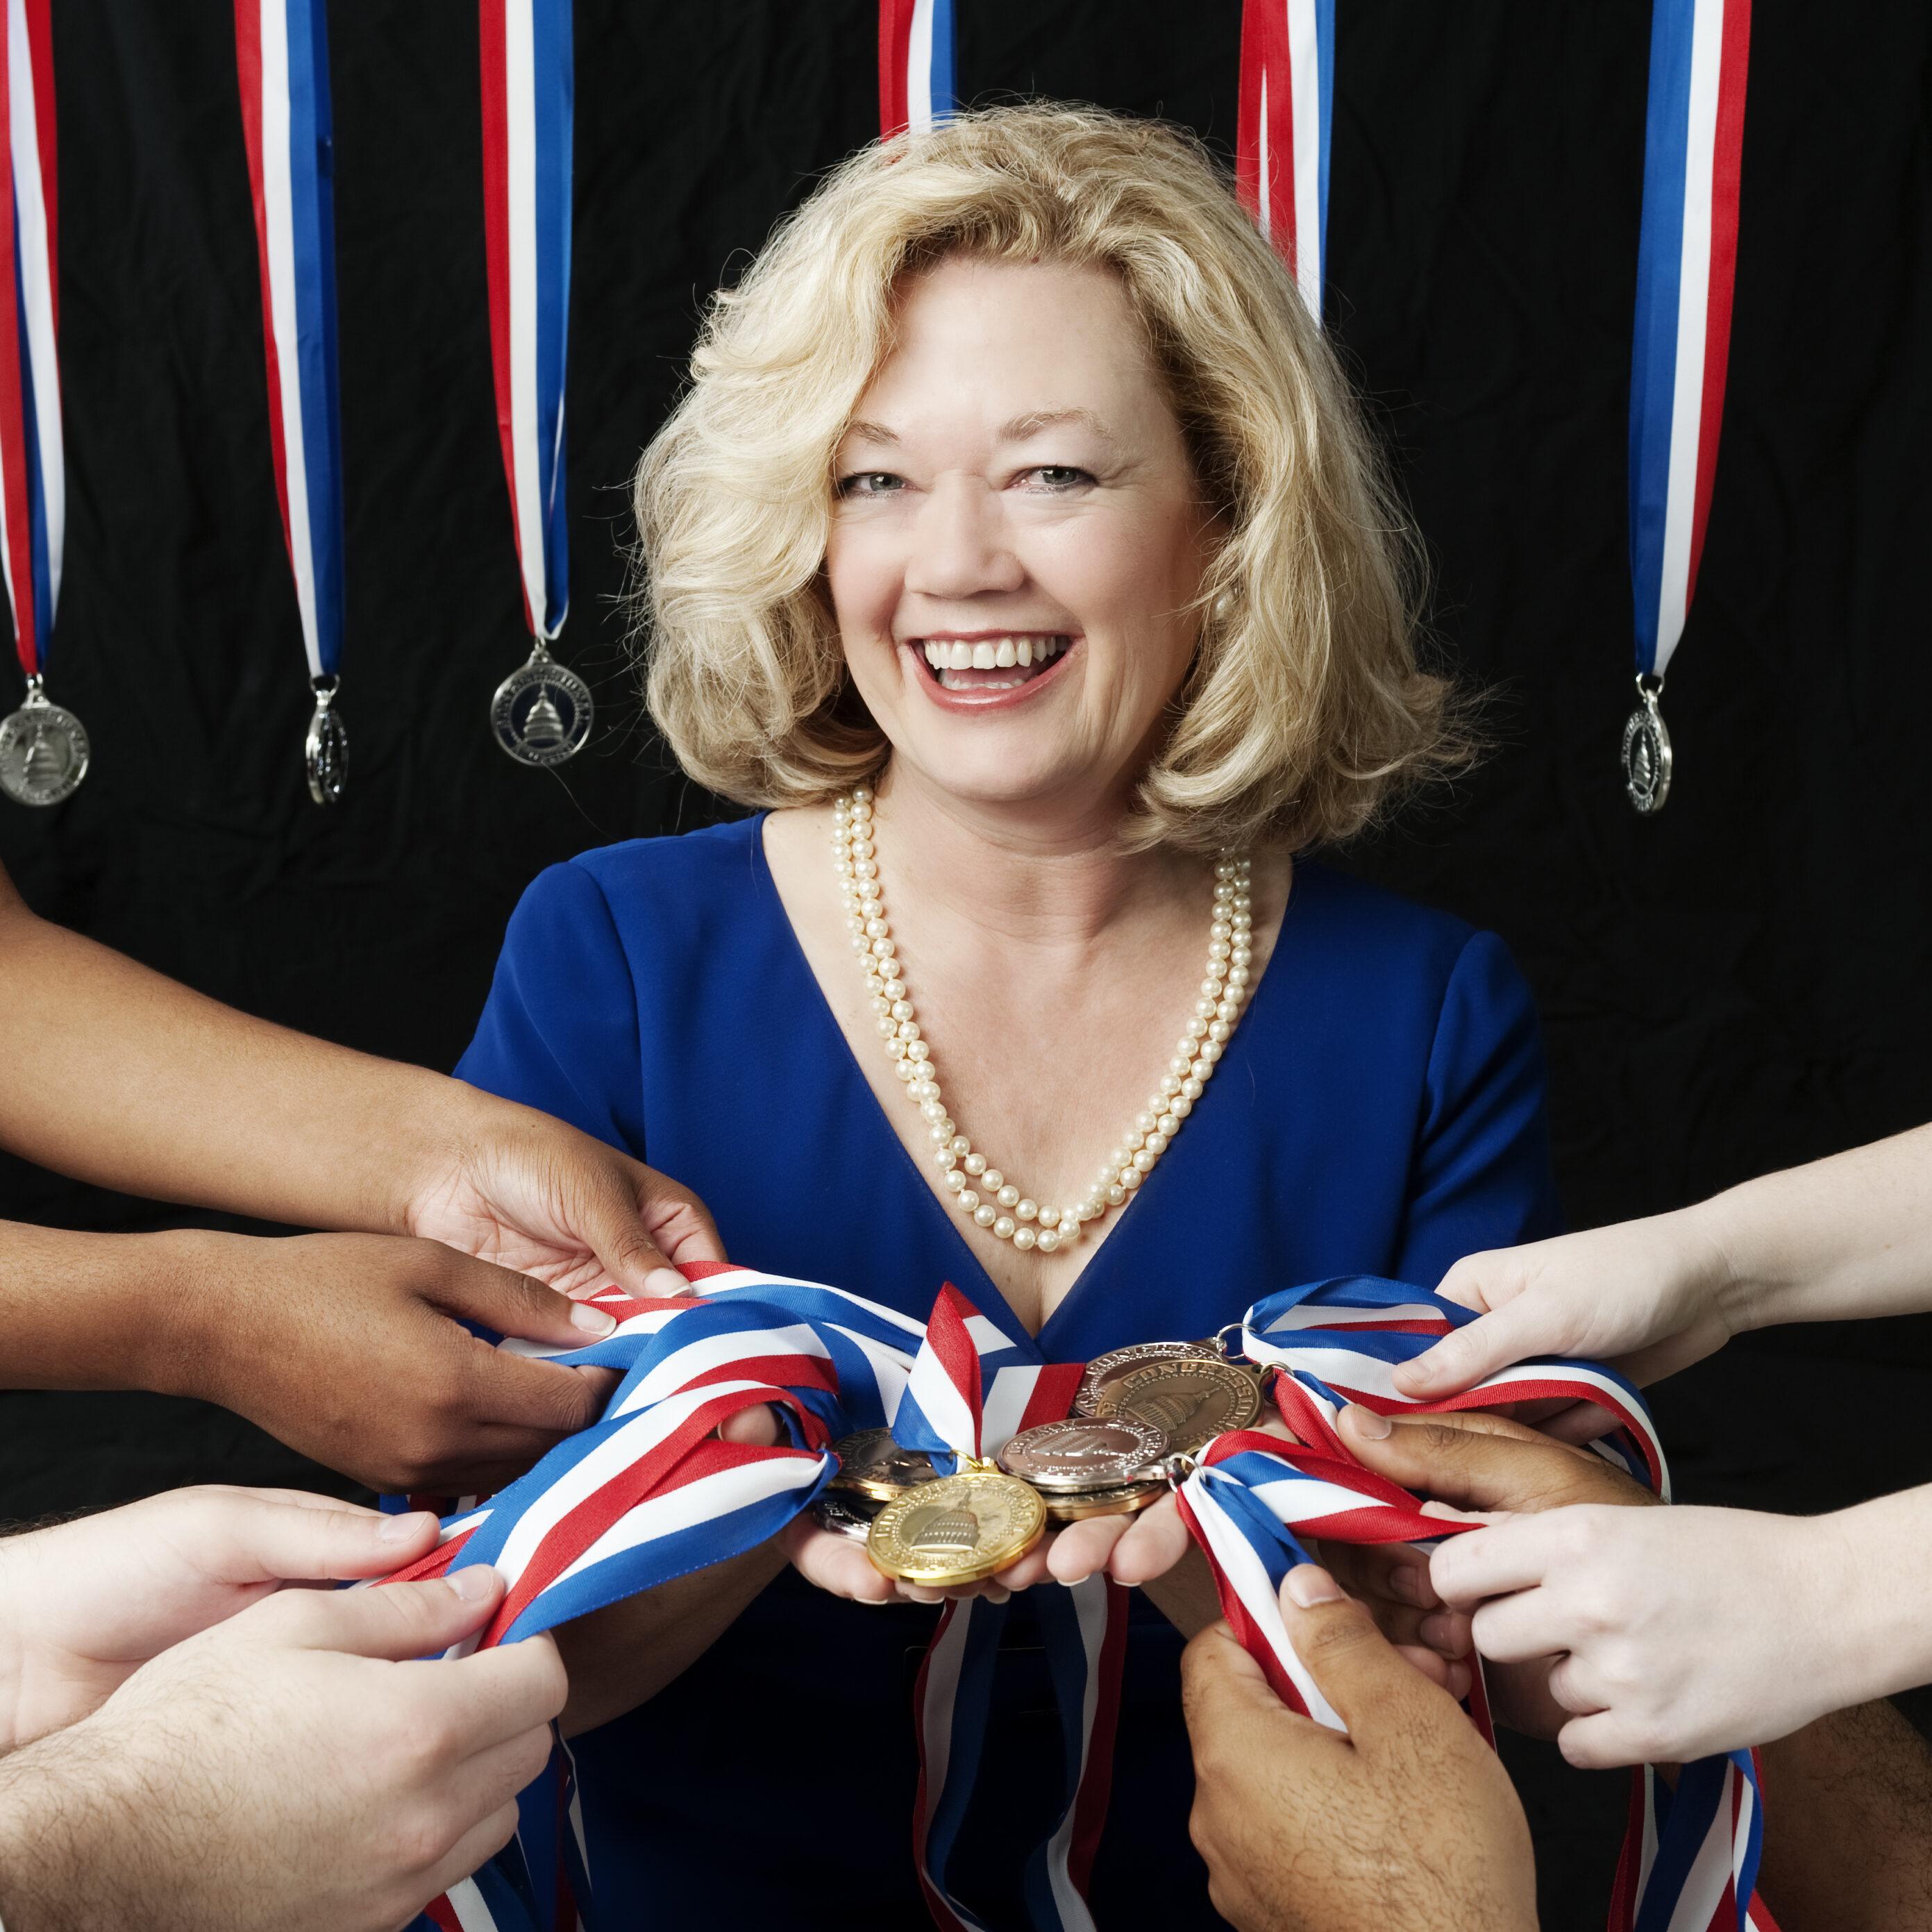 Dr. Linda Mitchell